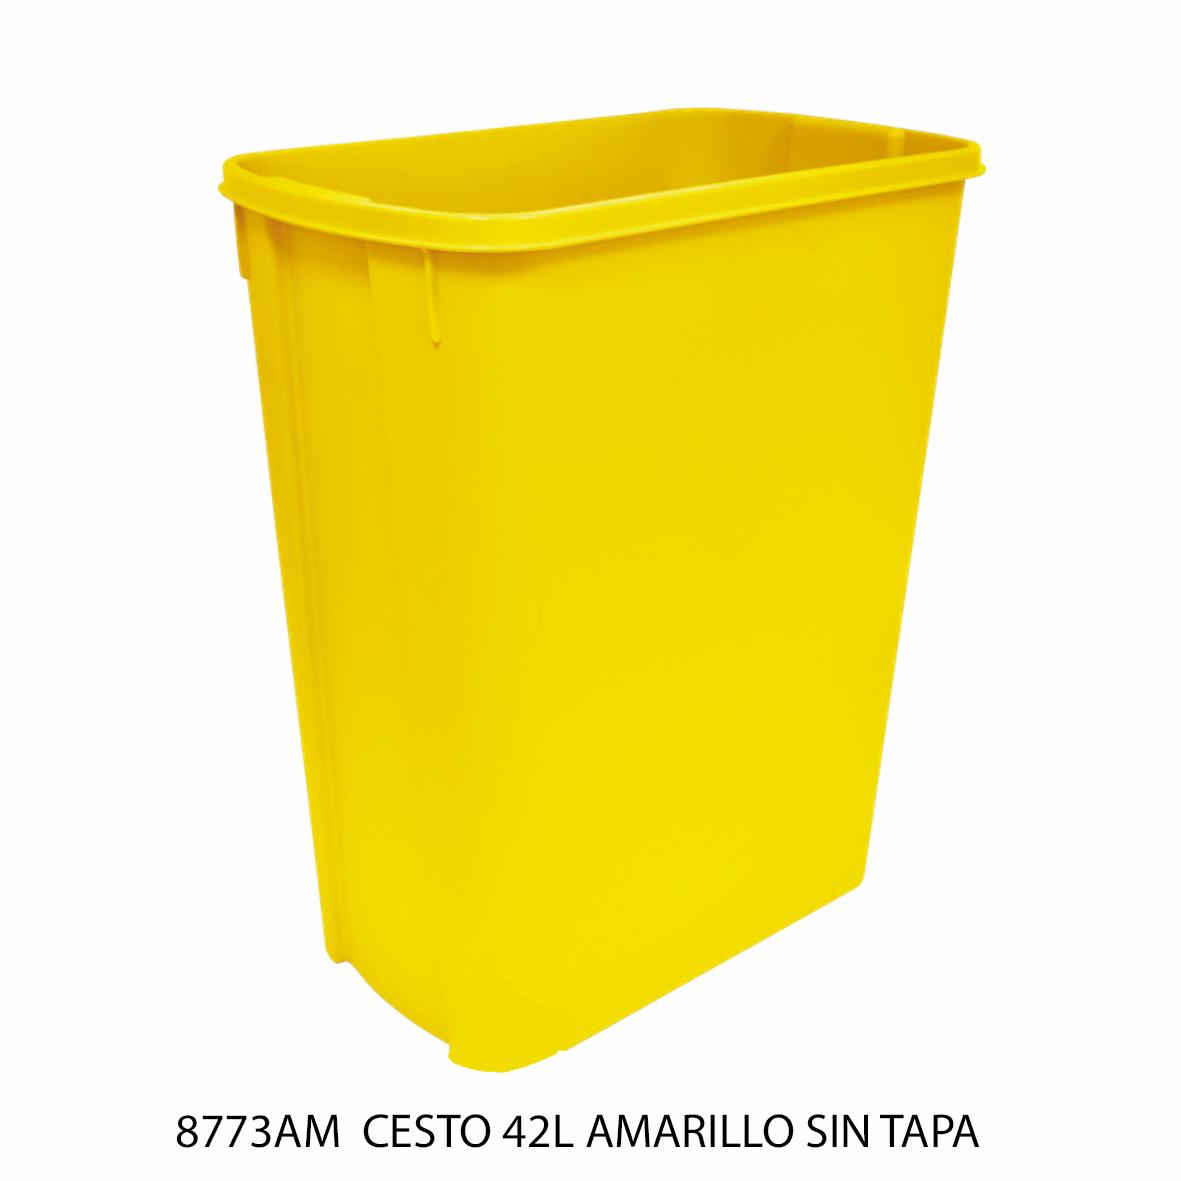 Bote de basura mediano de 42 litros sin tapa color amarillo modelo 8773AM de Sablón